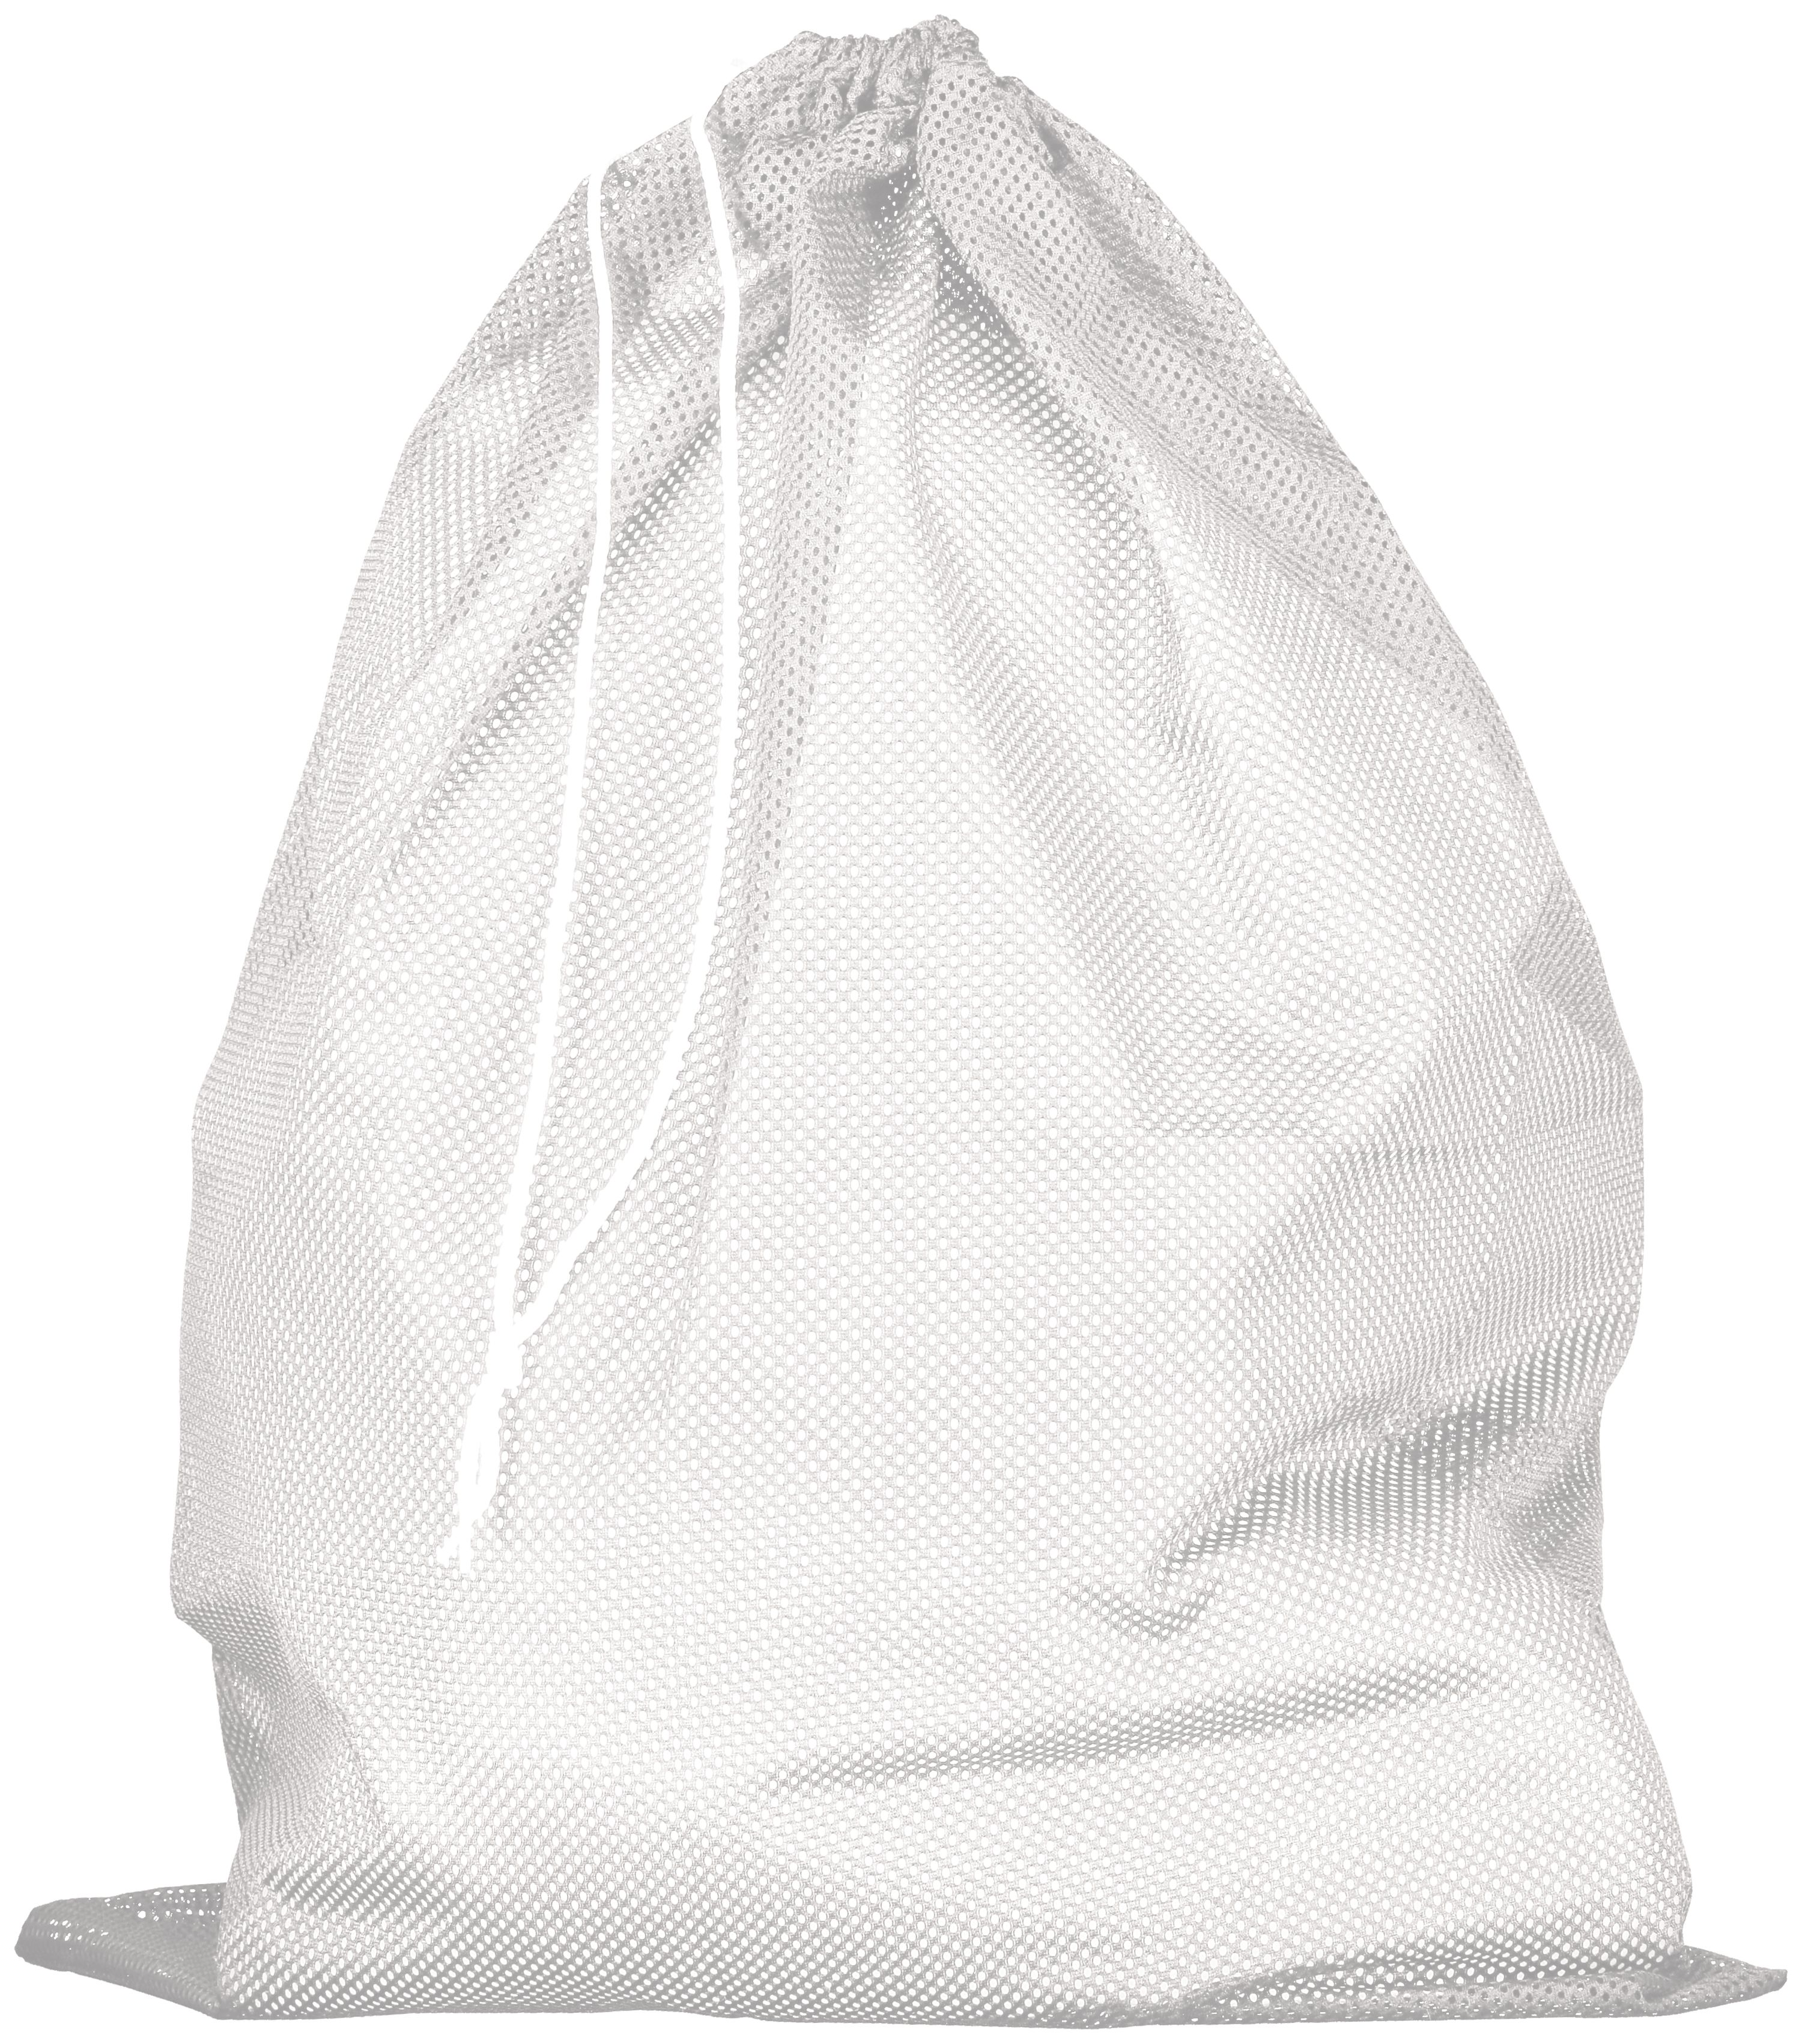 Mesh Laundry Bag - White